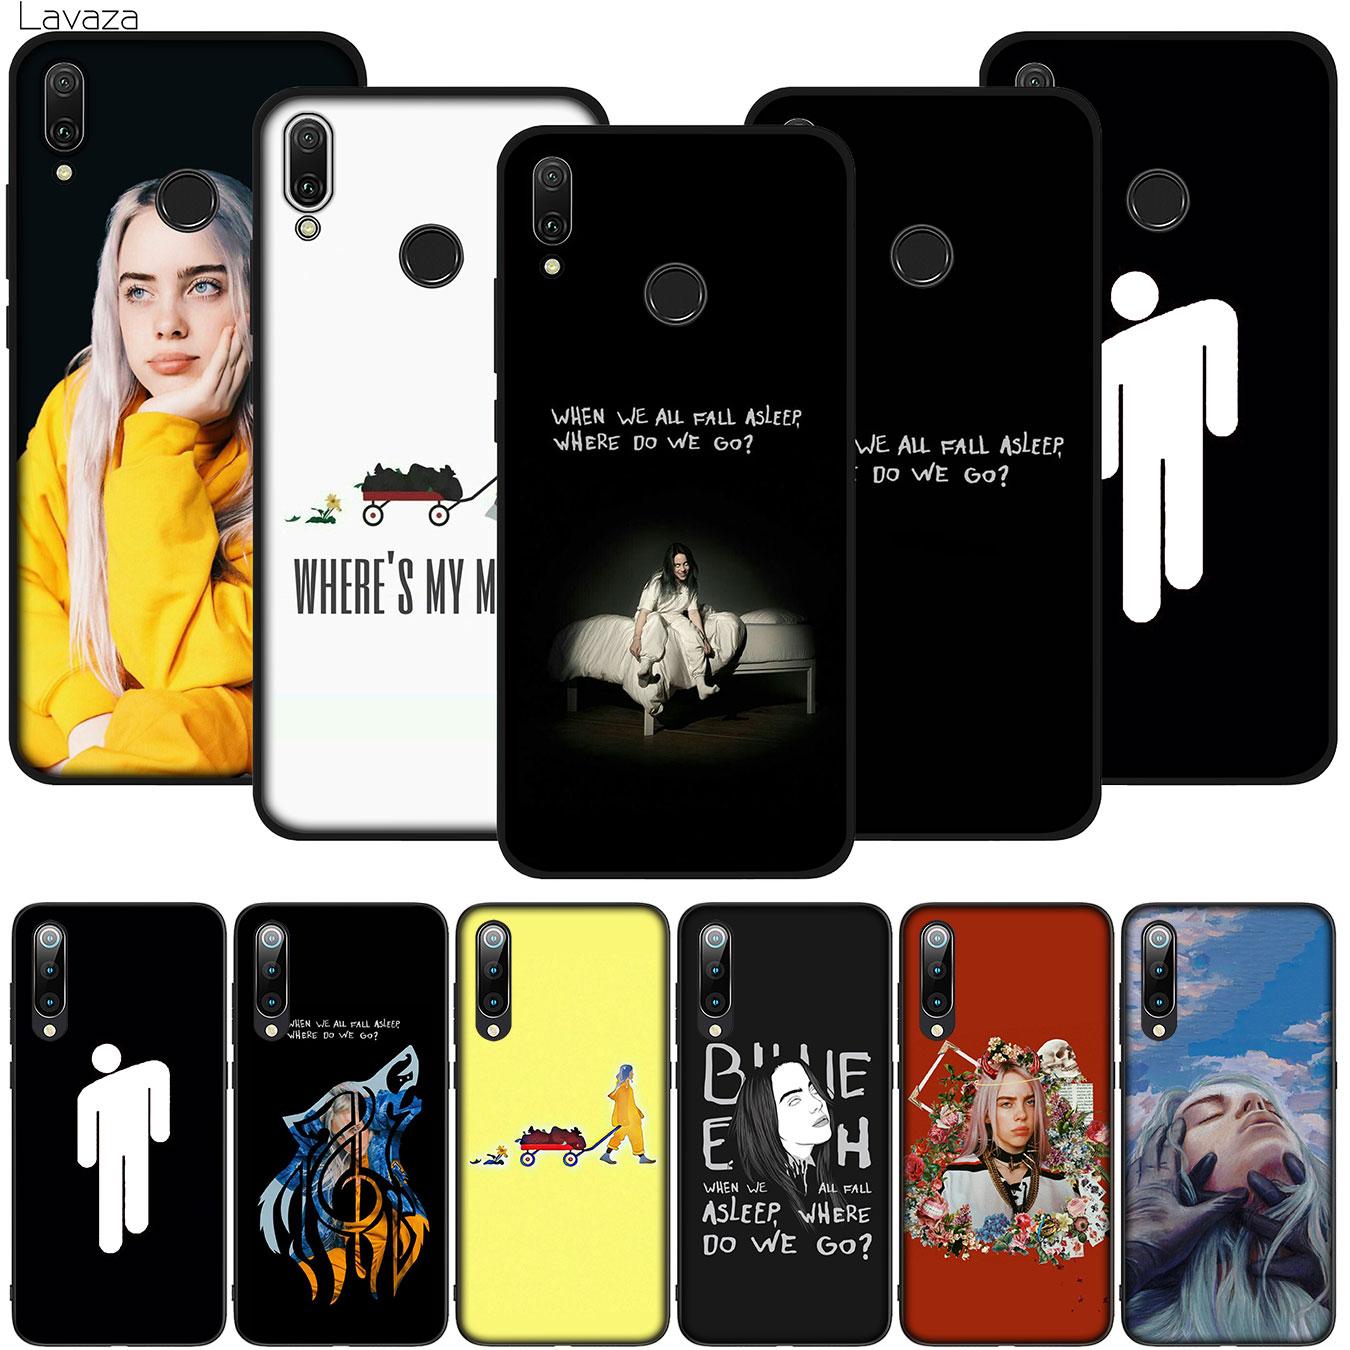 Funda dura para teléfono Lavaza Billie Eilish para Xiaomi Redmi K20 8A 7A 6A Note 8 8T 7 5 6 Pro 4 4X